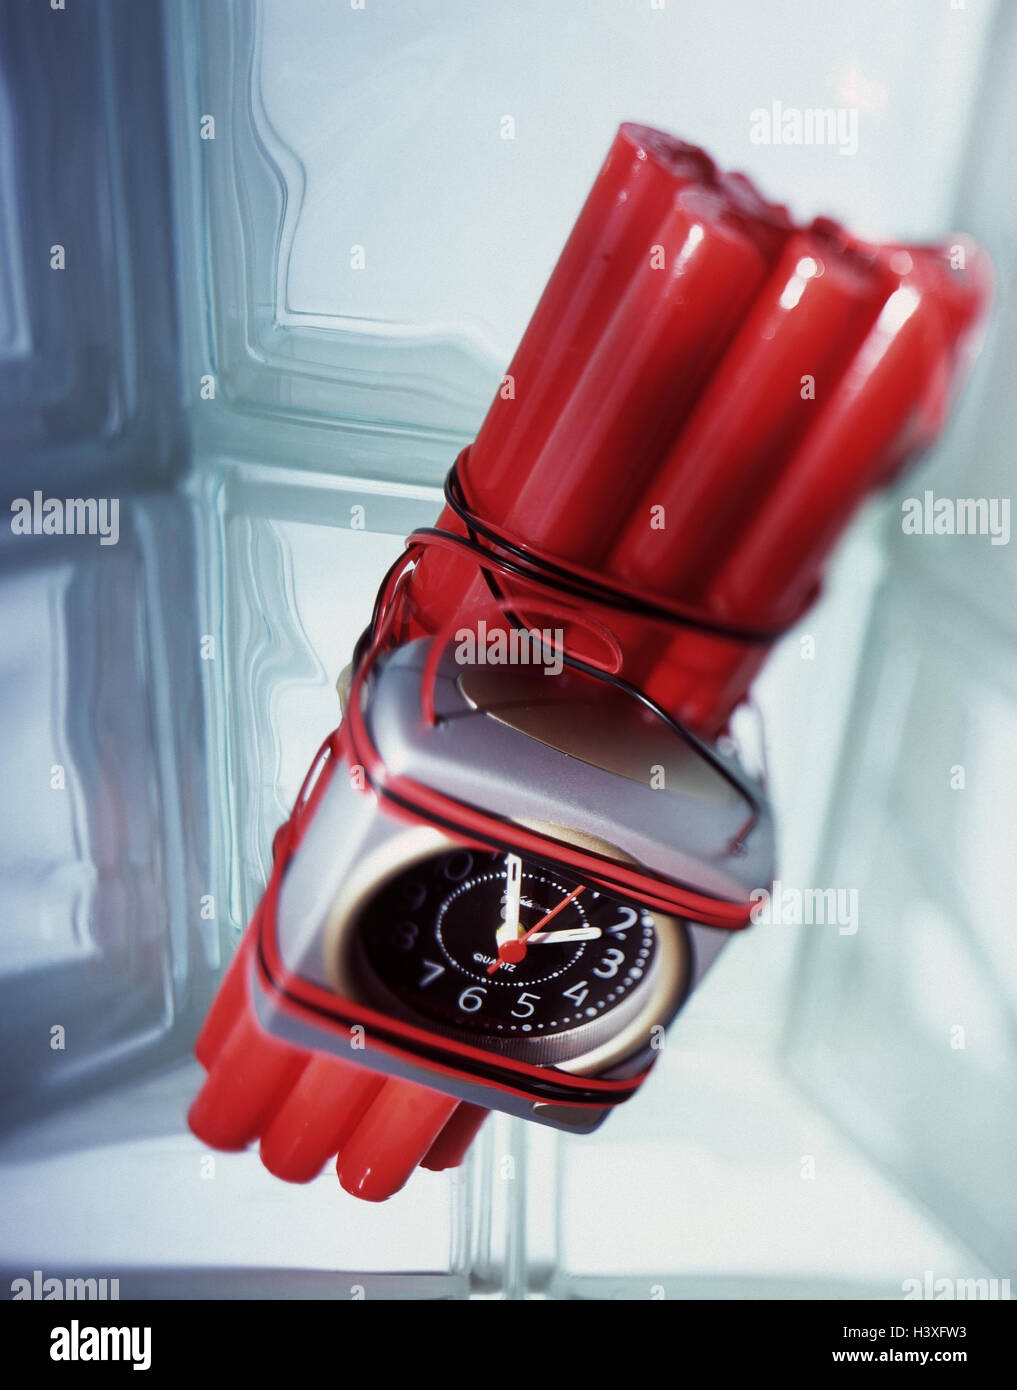 Dynamite sticks, time fuses, explosive charge, sprinkle, terrorism, weapon, clock, alarm clock, spraying, crime, - Stock Image